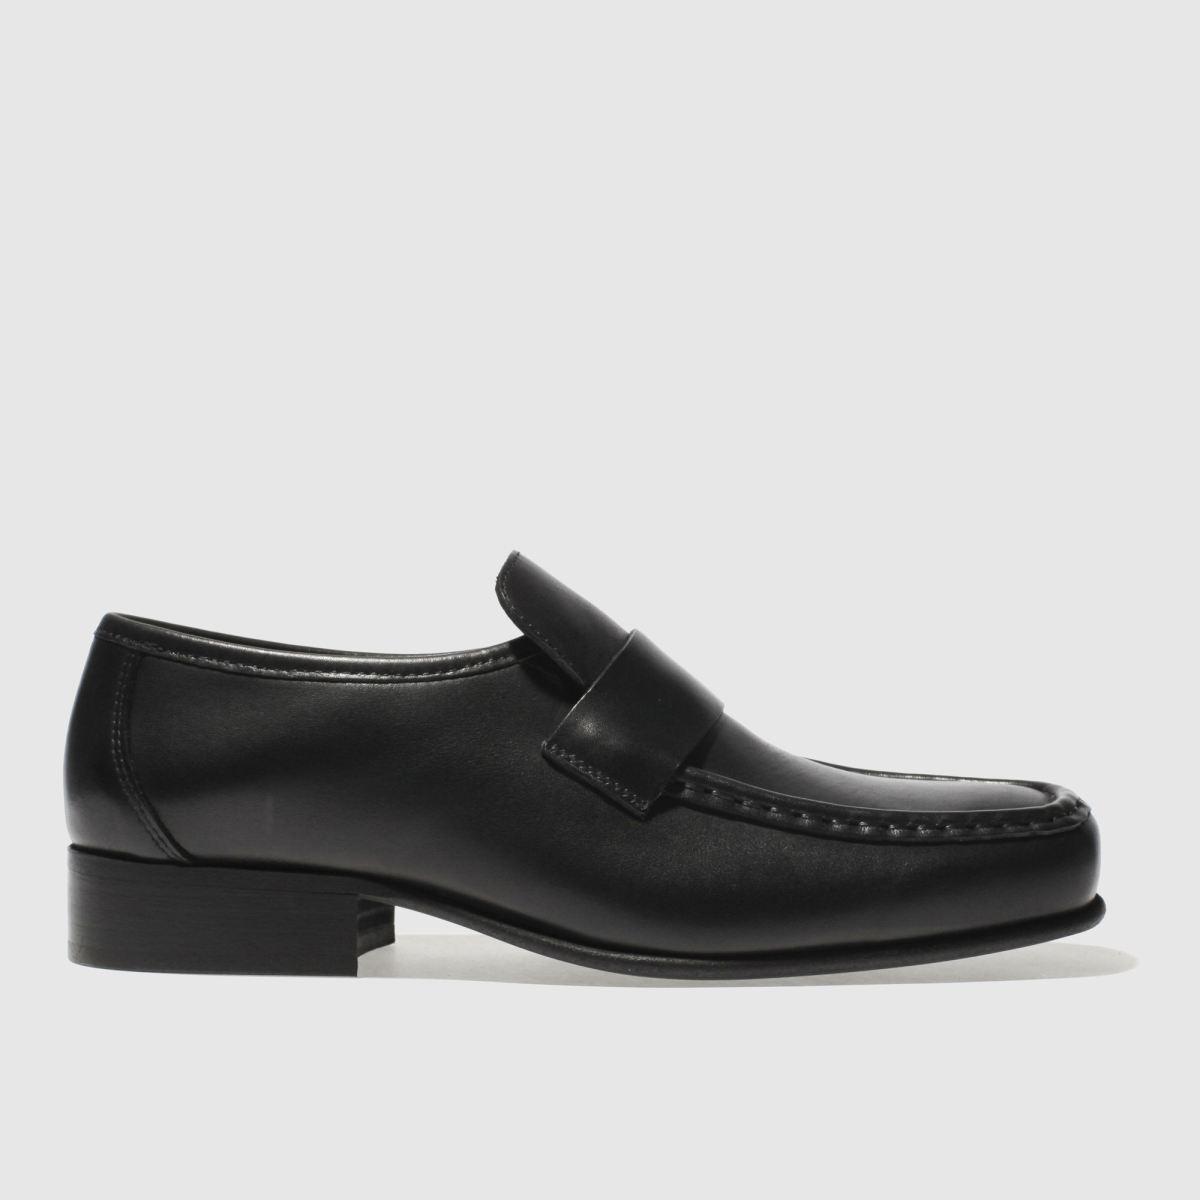 Schuh Black Argent Stax Shoes